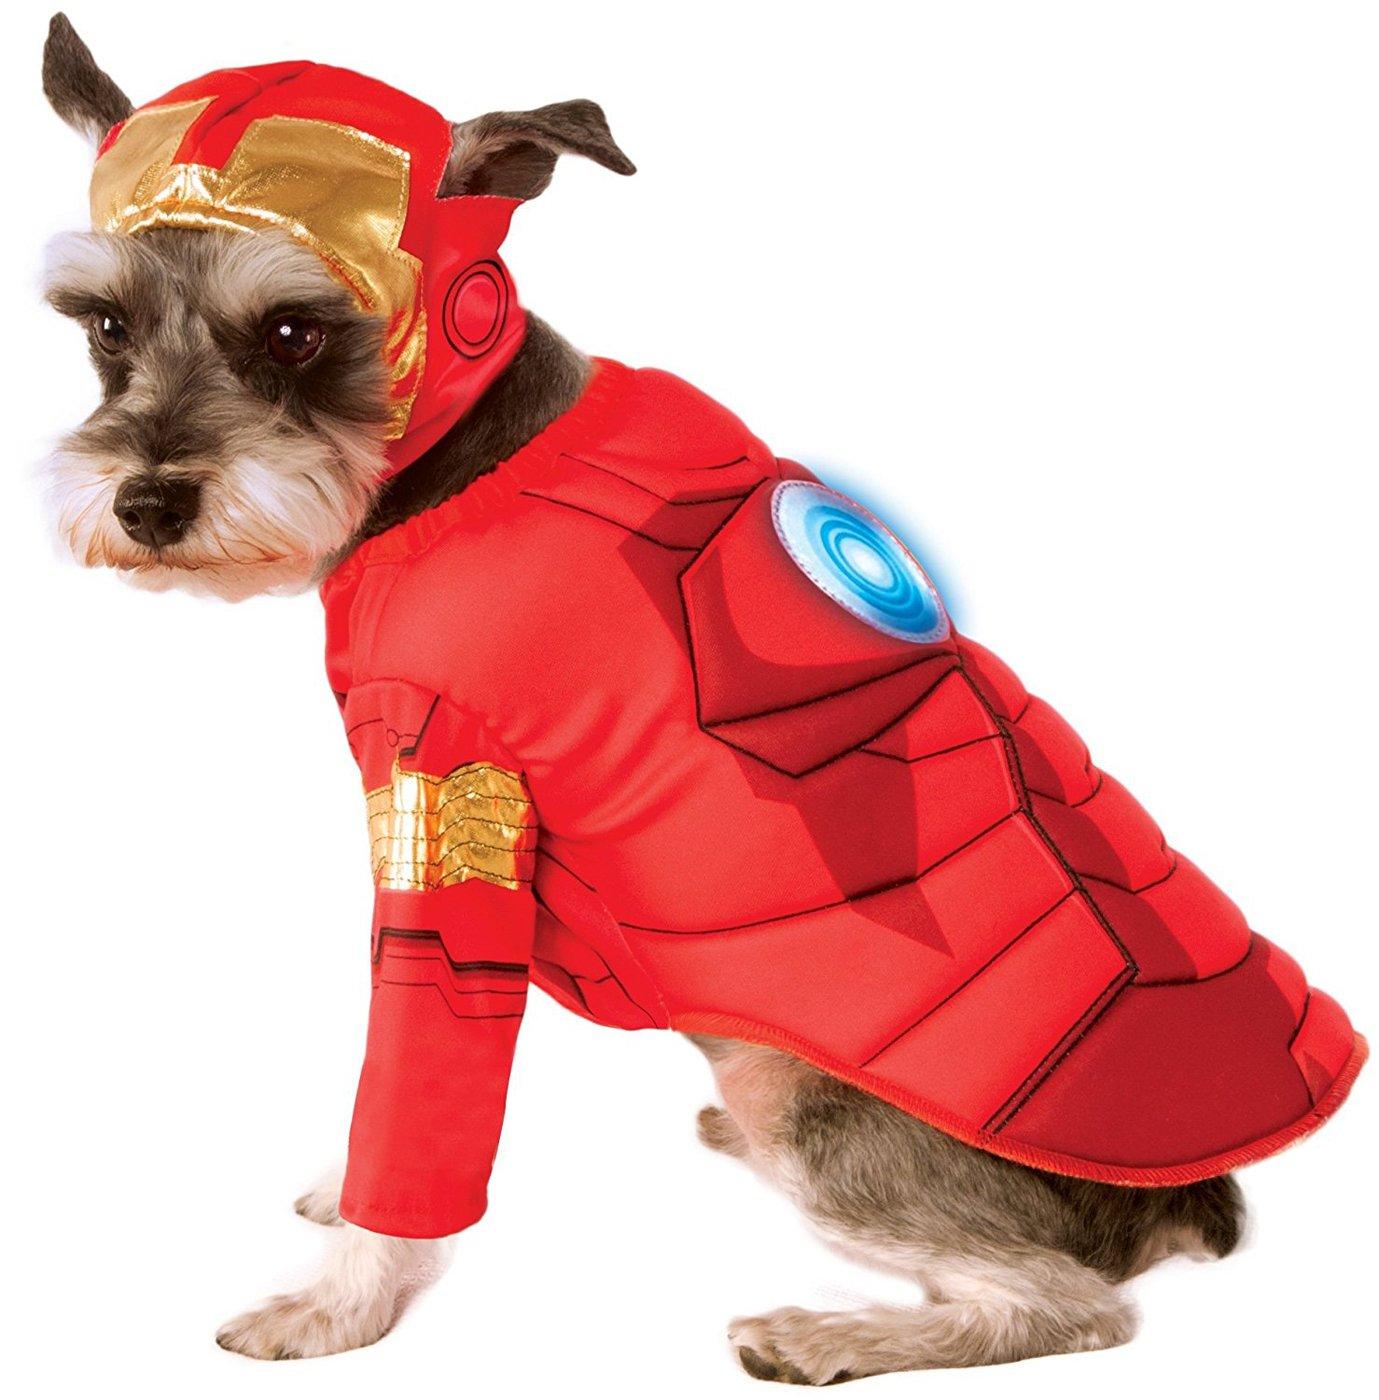 Rubie's Avengers Assemble Deluxe Iron Man Pet Costume, Medium